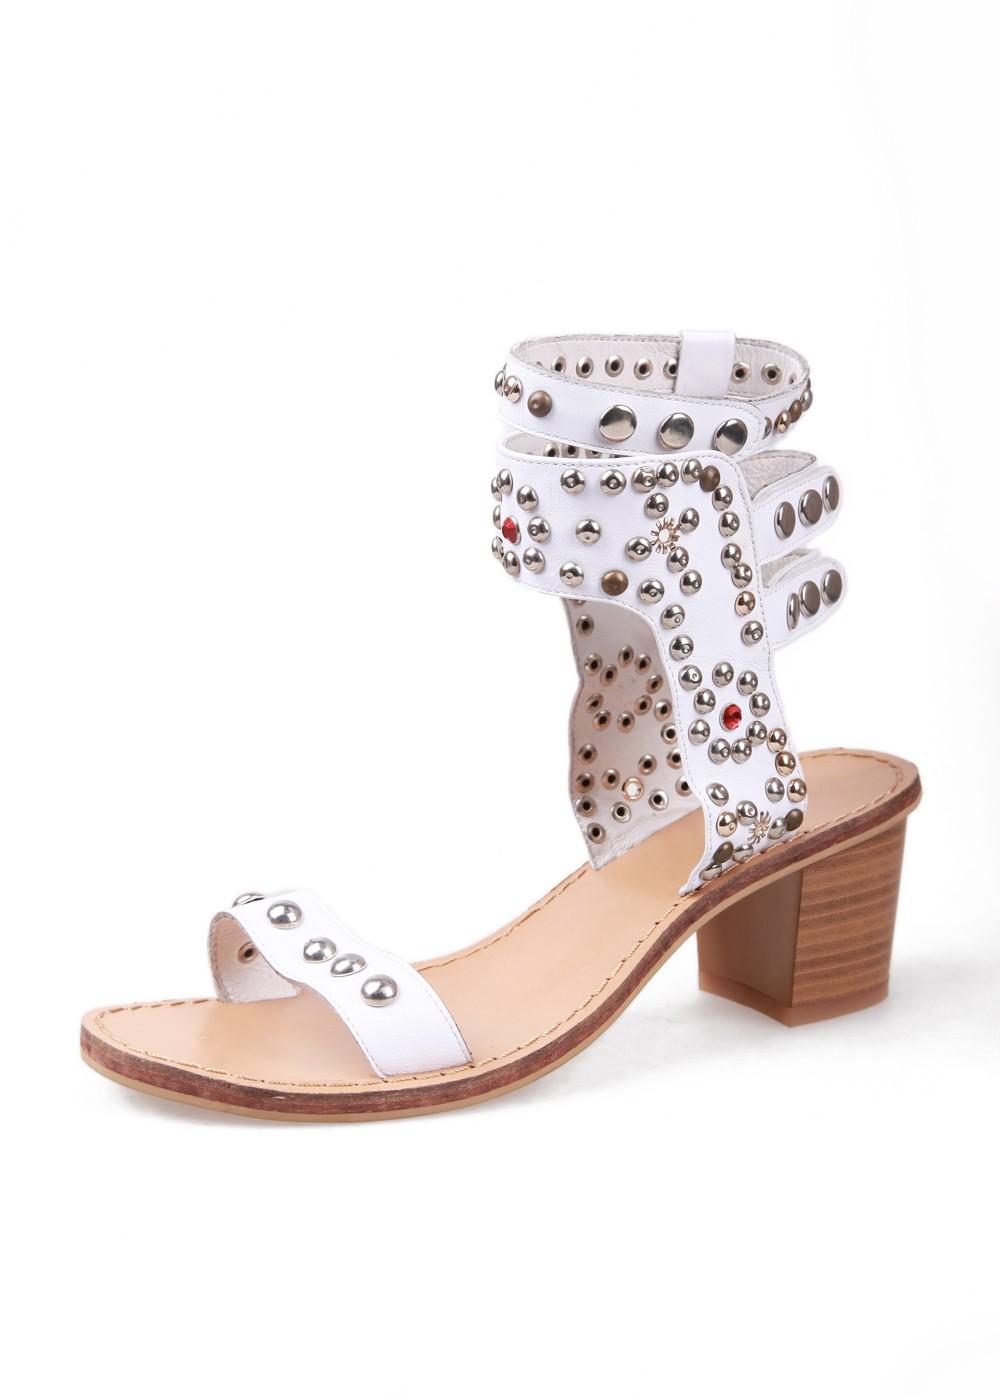 Anna Xi Monica Studded Sandal